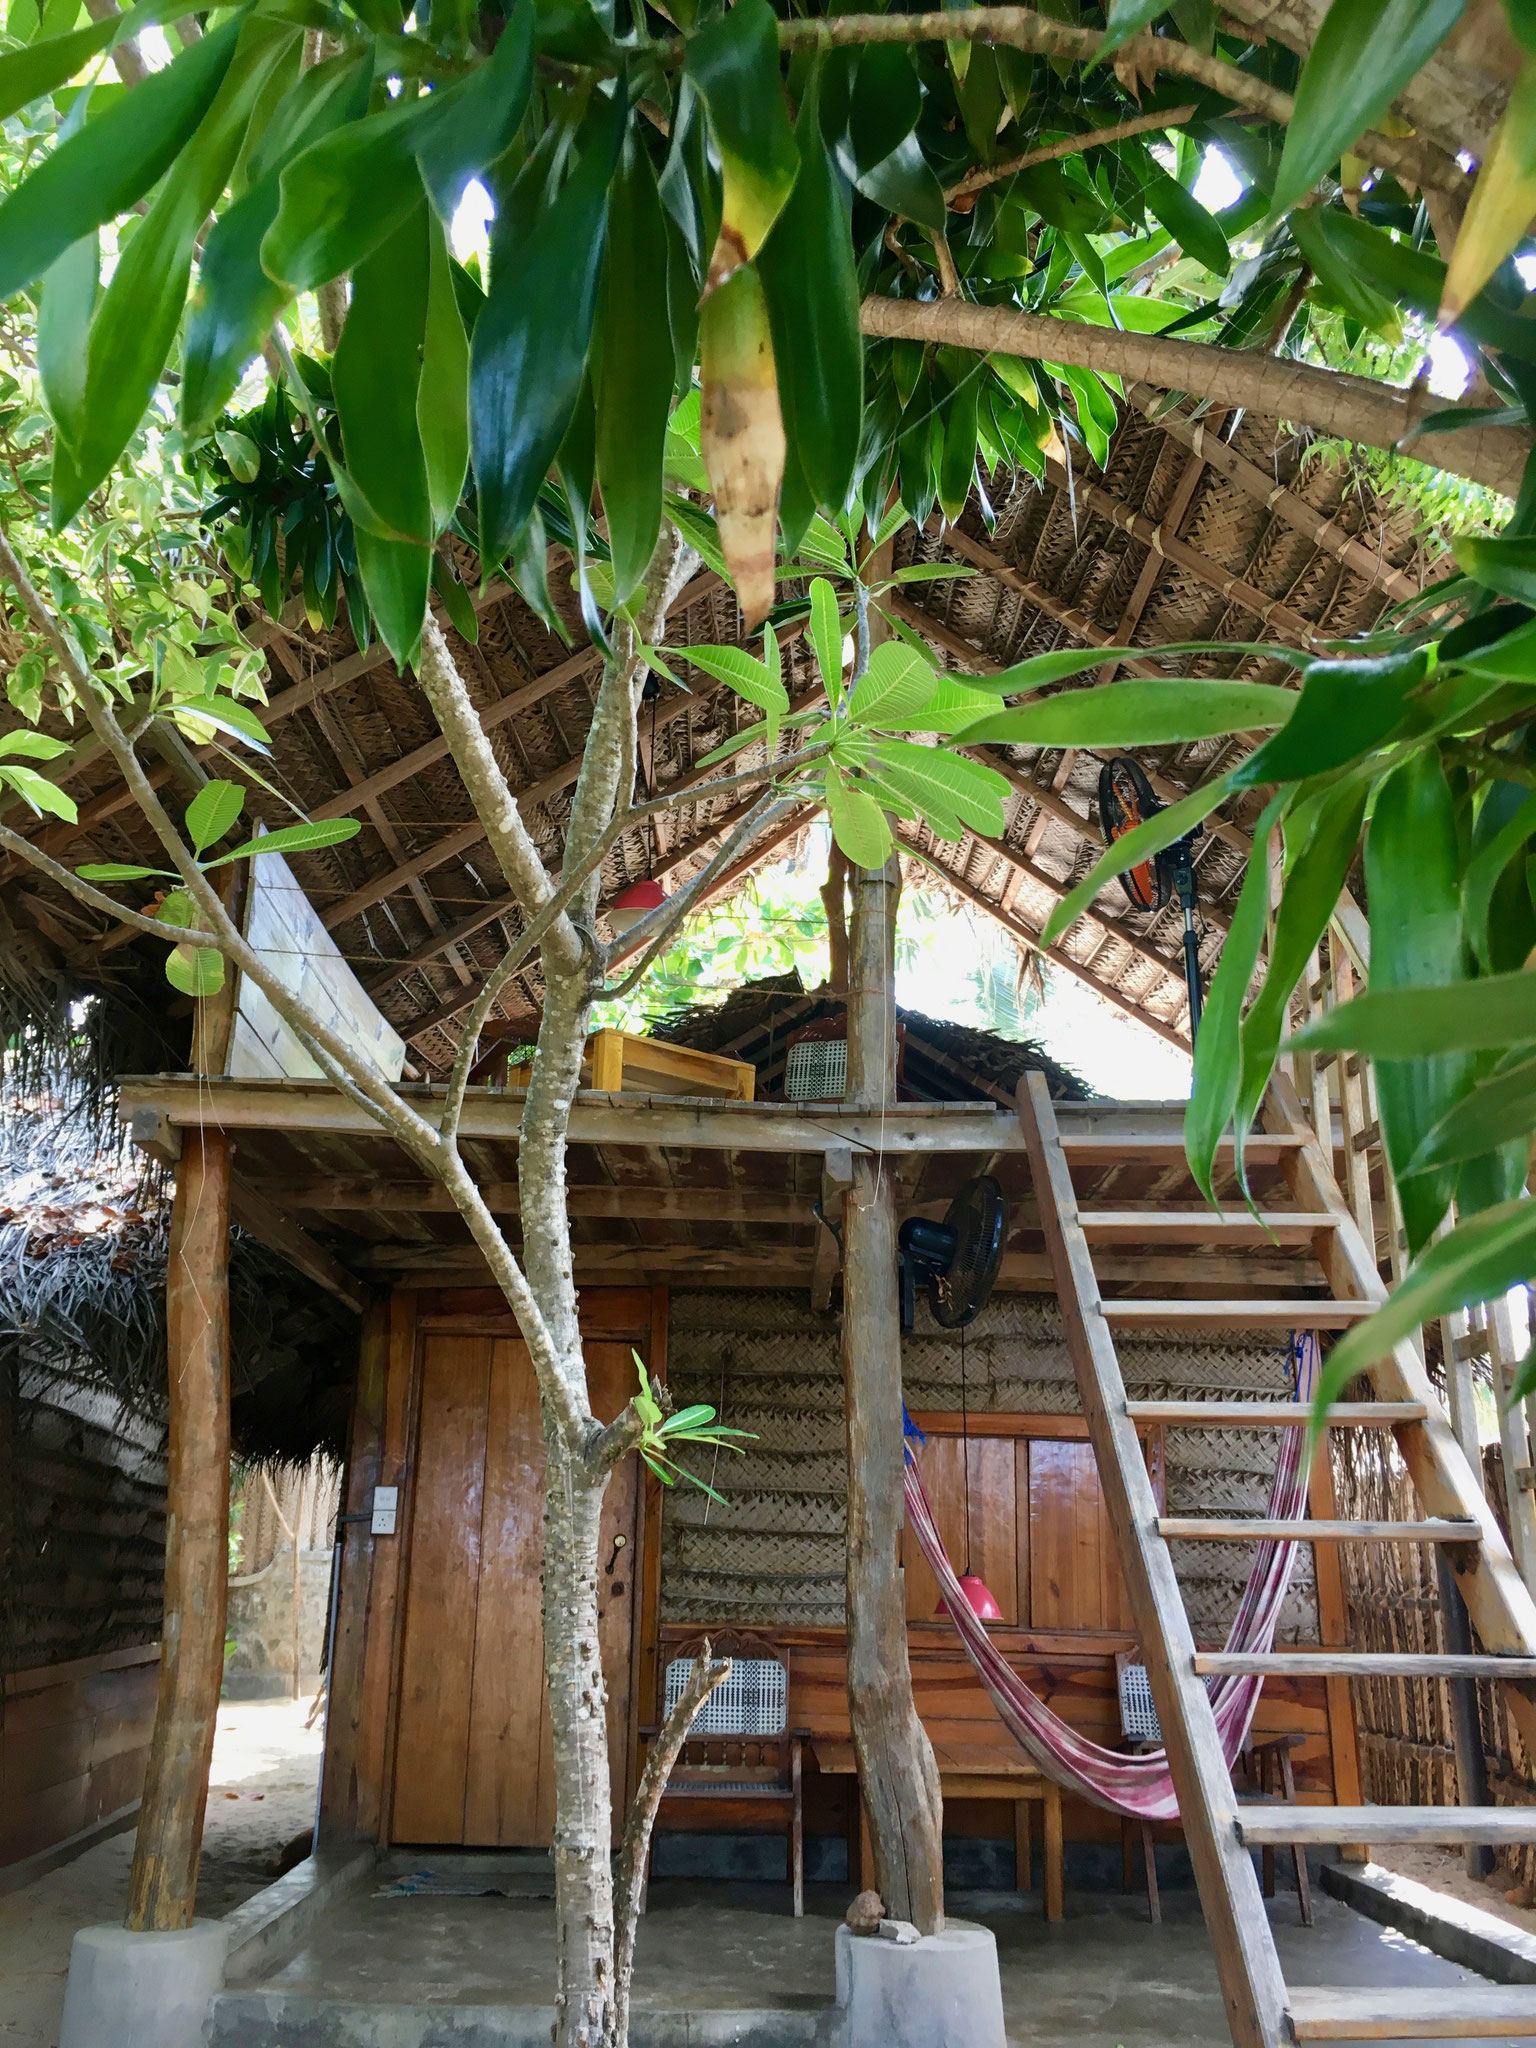 The Lani Cabana